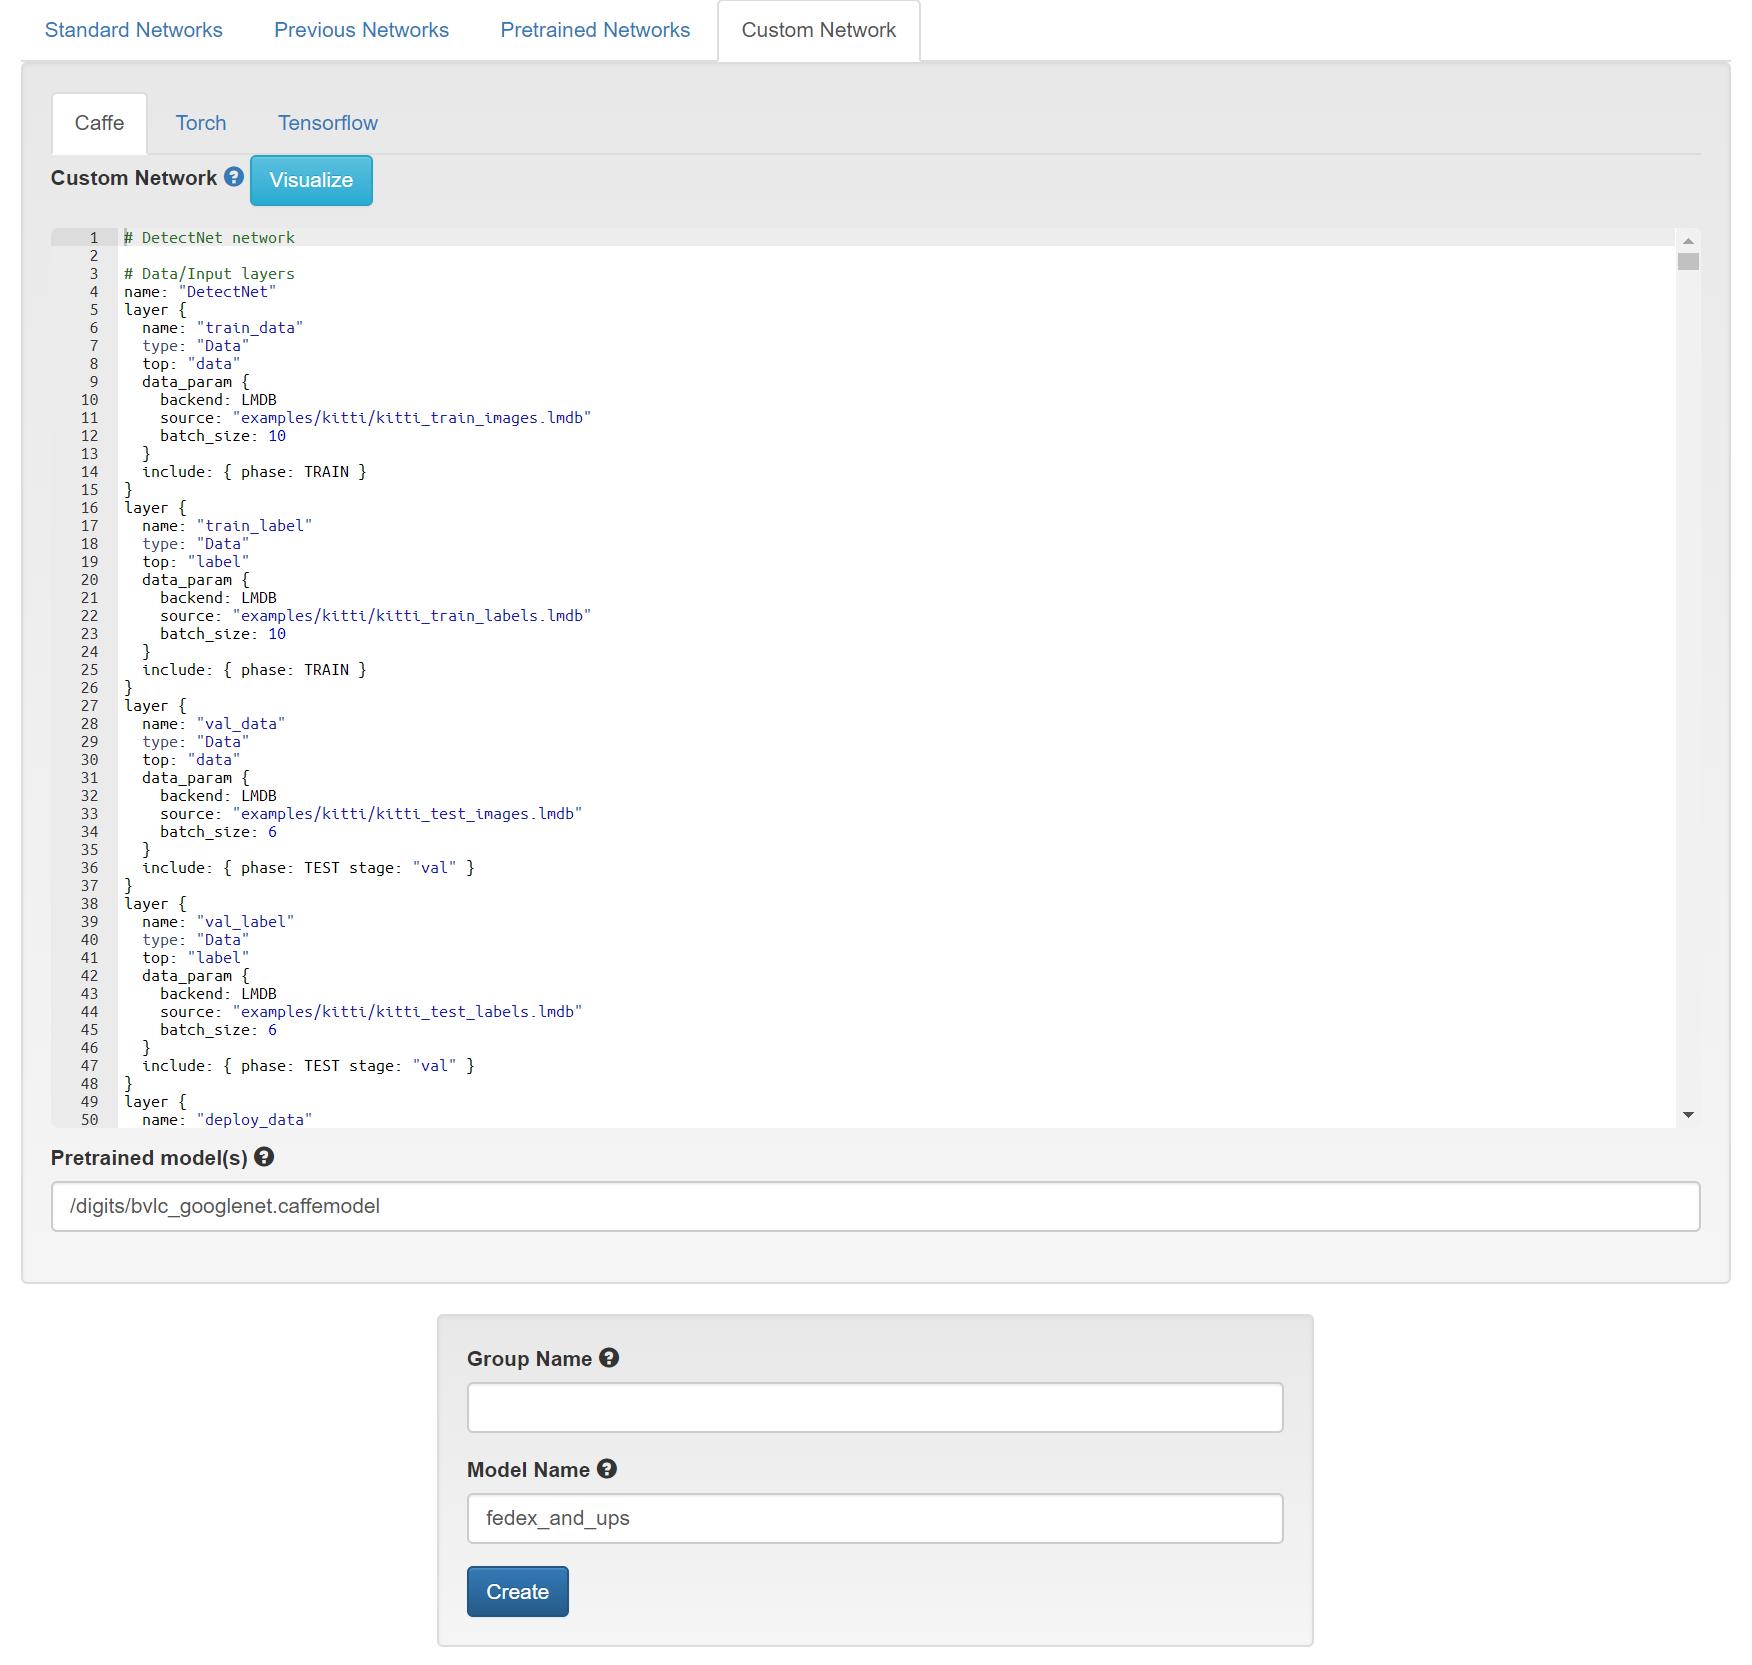 Training a Custom Multiclass Object Detection Model Using